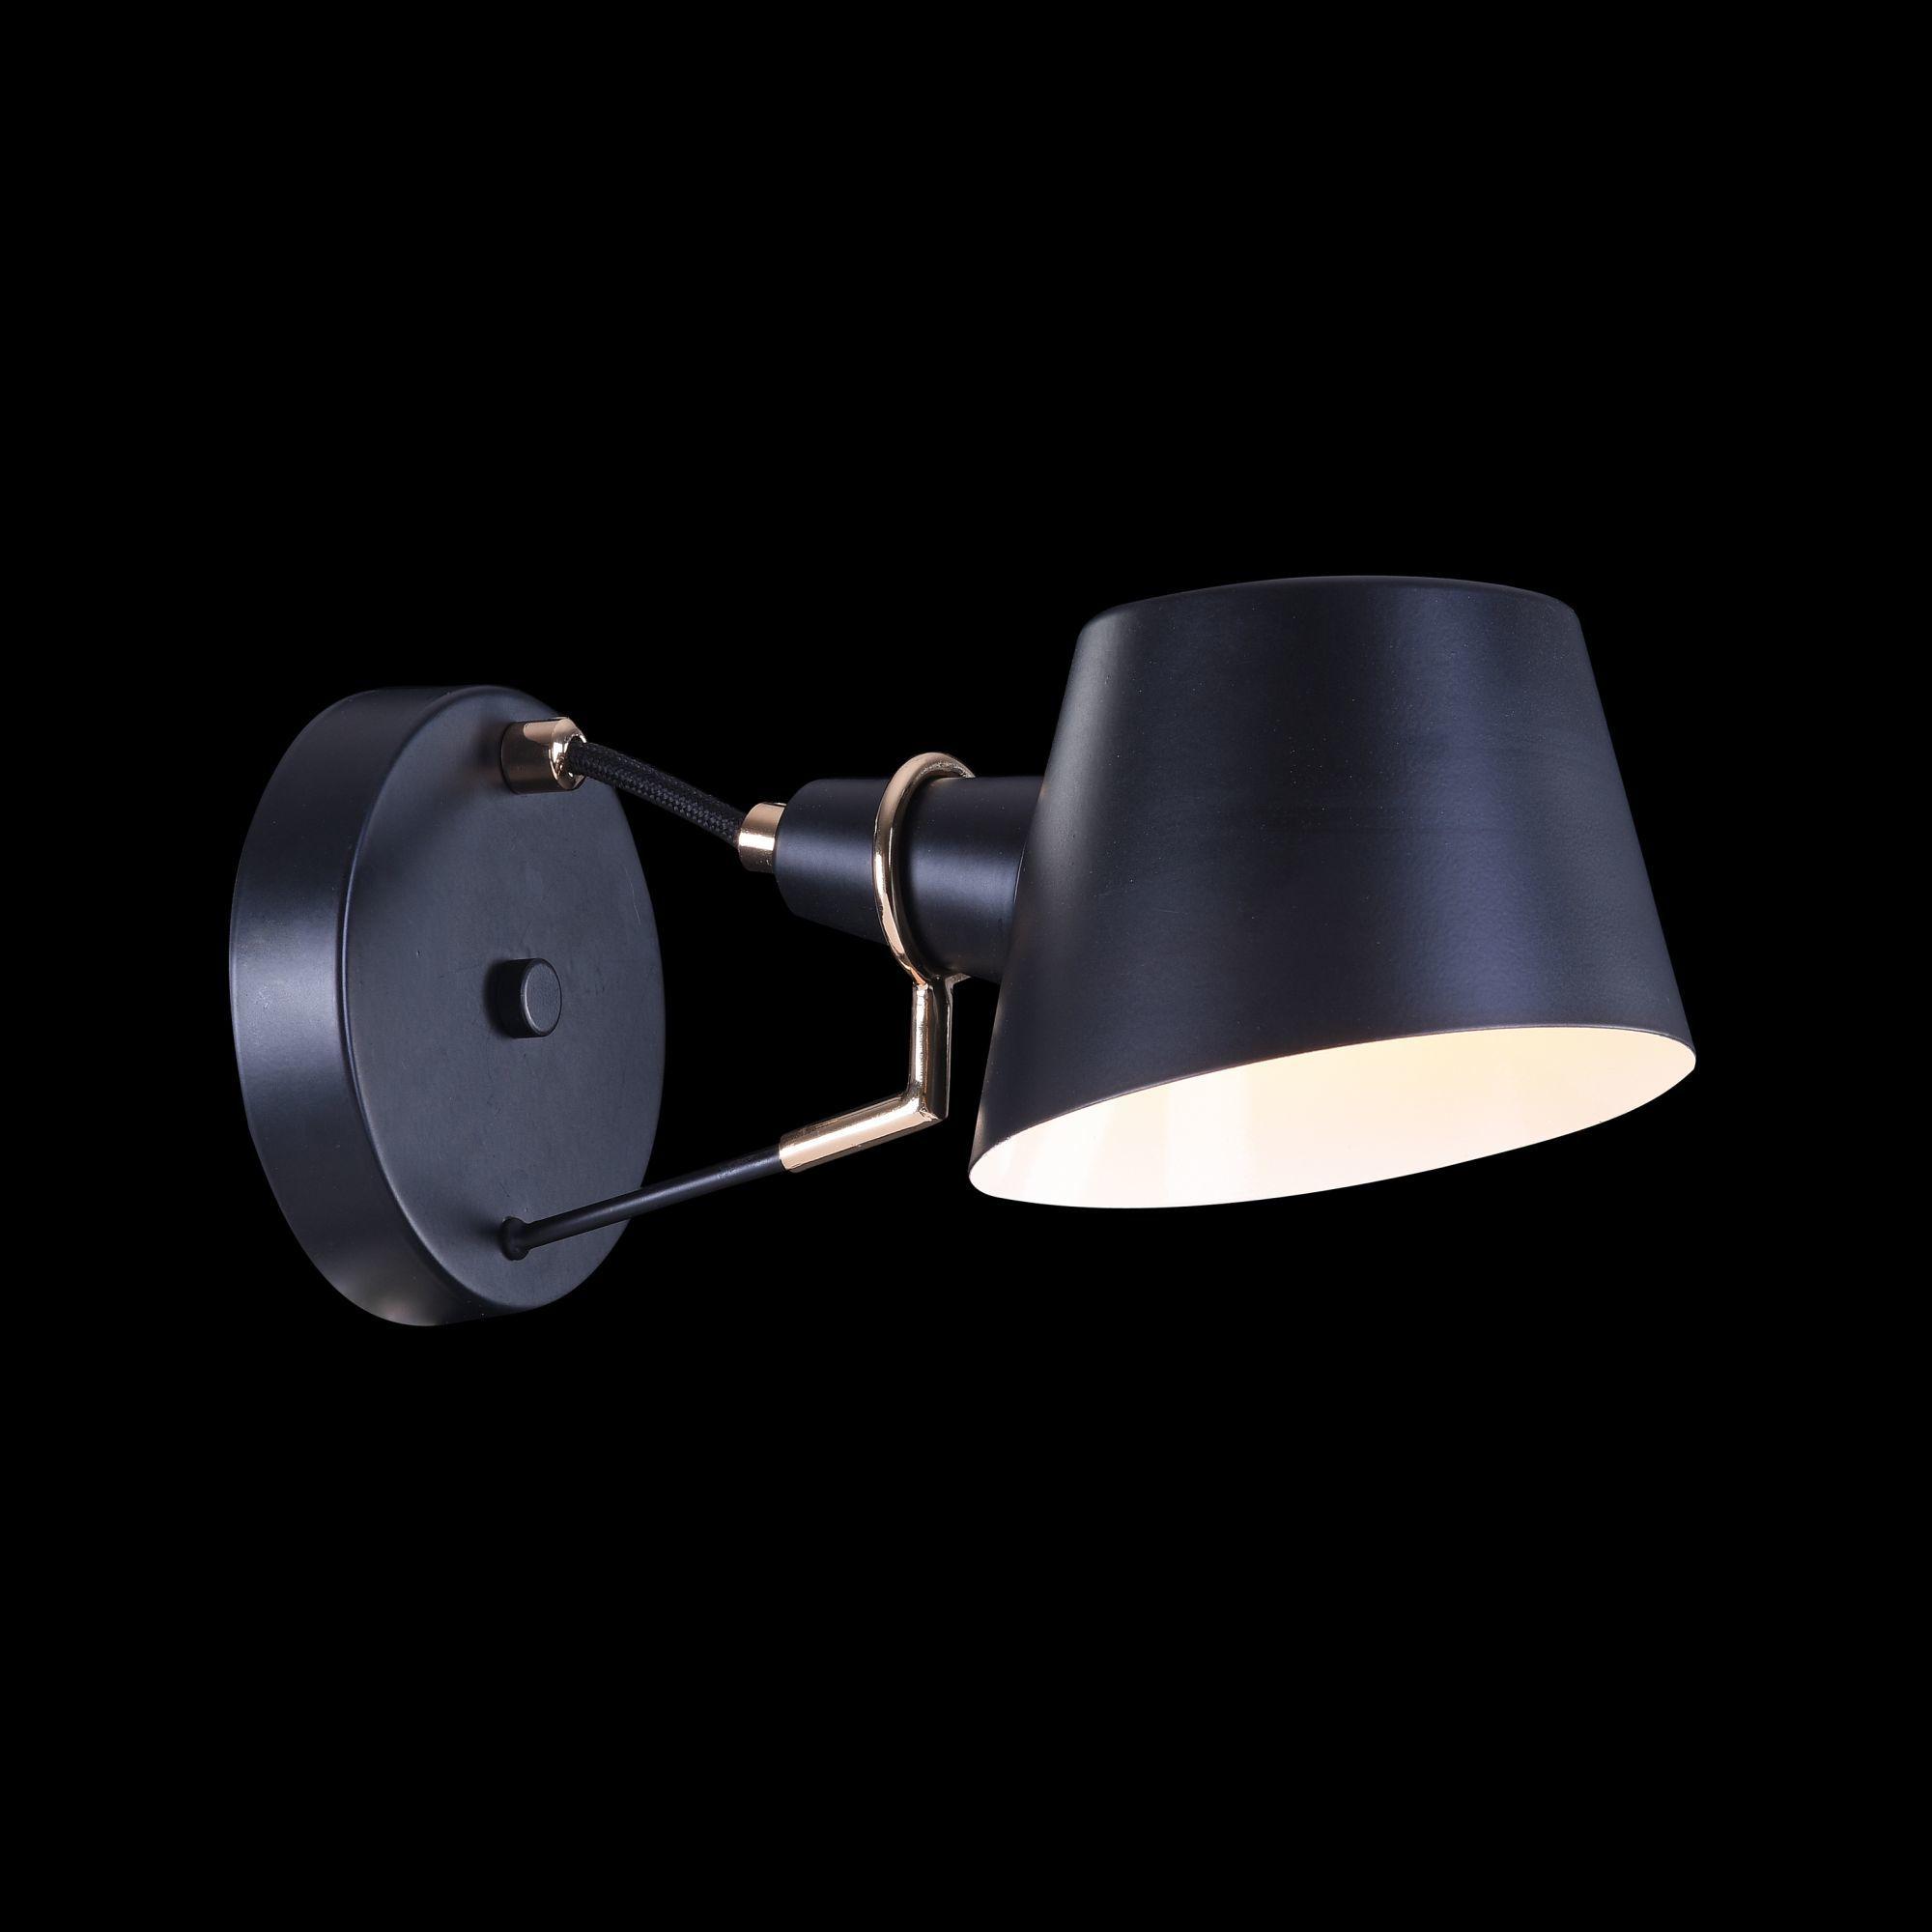 Бра Freya Abigail FR5038-WL-01-B, 1xE14x40W, черный, металл - фото 3